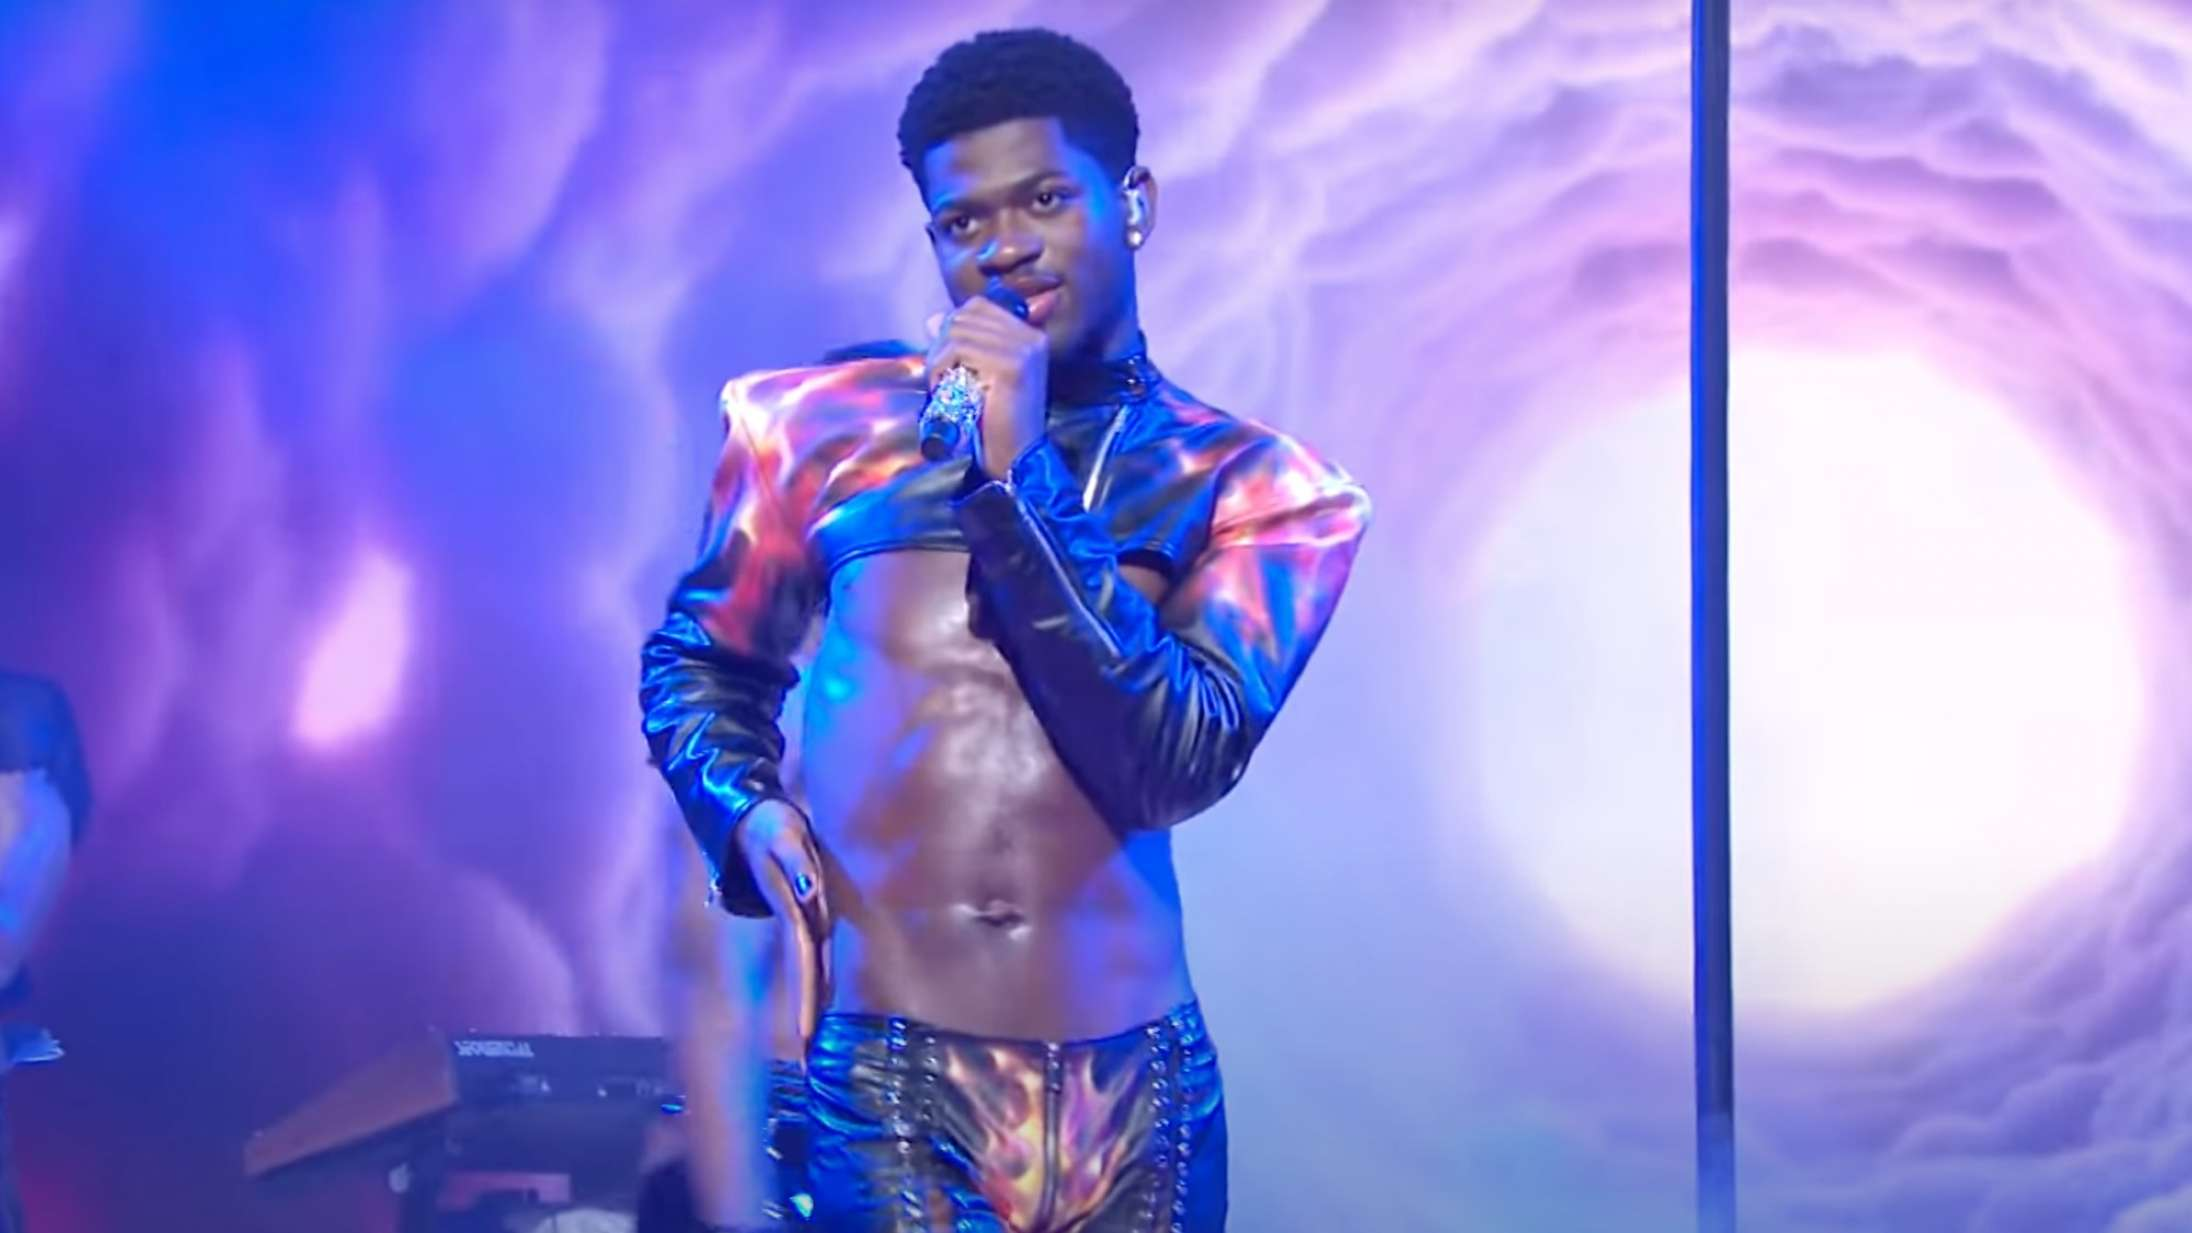 Se Lil Nas X' bukser revne under vild 'SNL'-optræden med verdenshittet 'Montero'